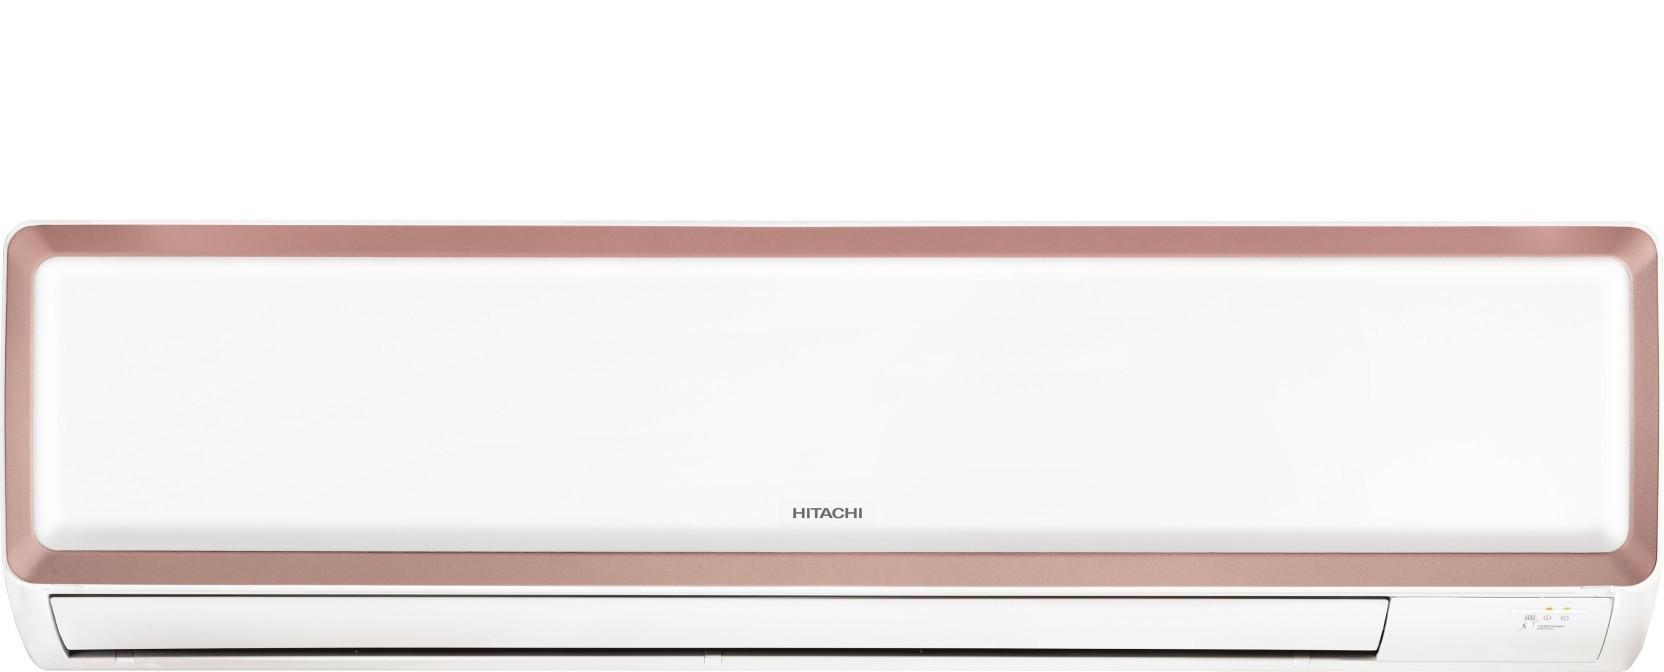 View Hitachi 1.5 Ton Inverter (3 Star) Split AC  - White(RSI/CSI/ESI-318EAEA, Copper Condenser)  Price Online